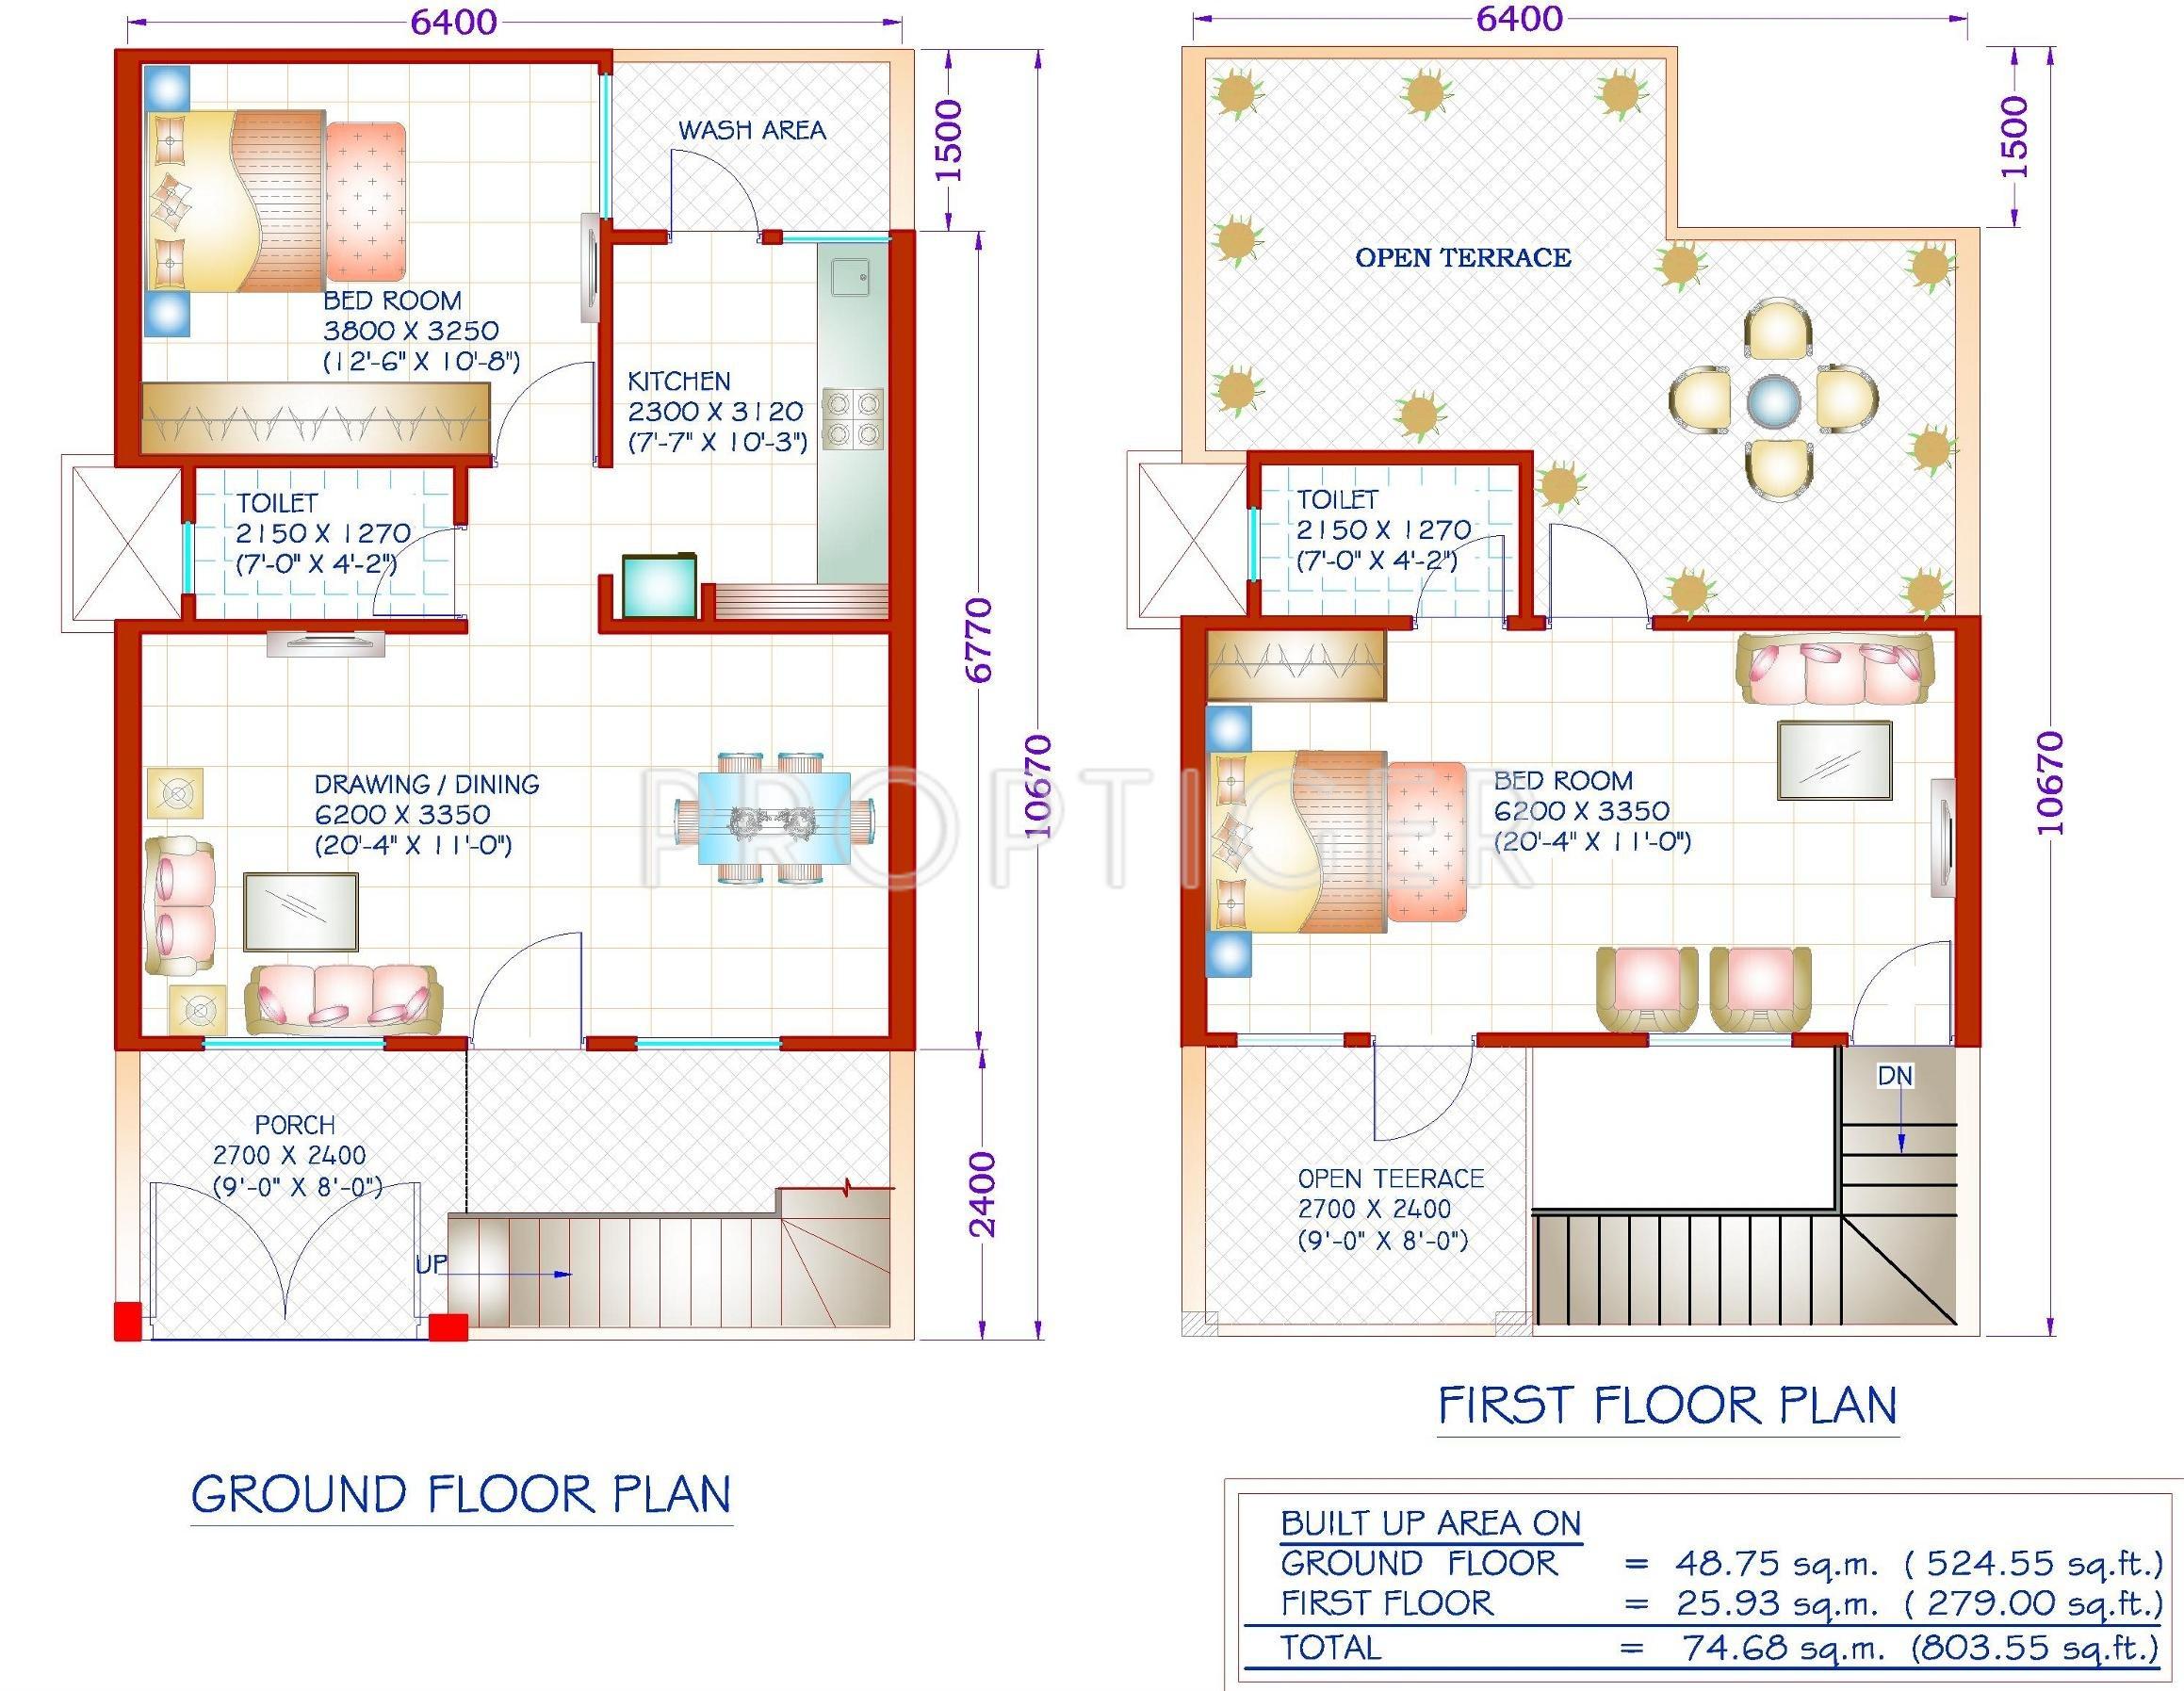 900 Sq Ft Duplex House Plans In India GaesteBefragung Com